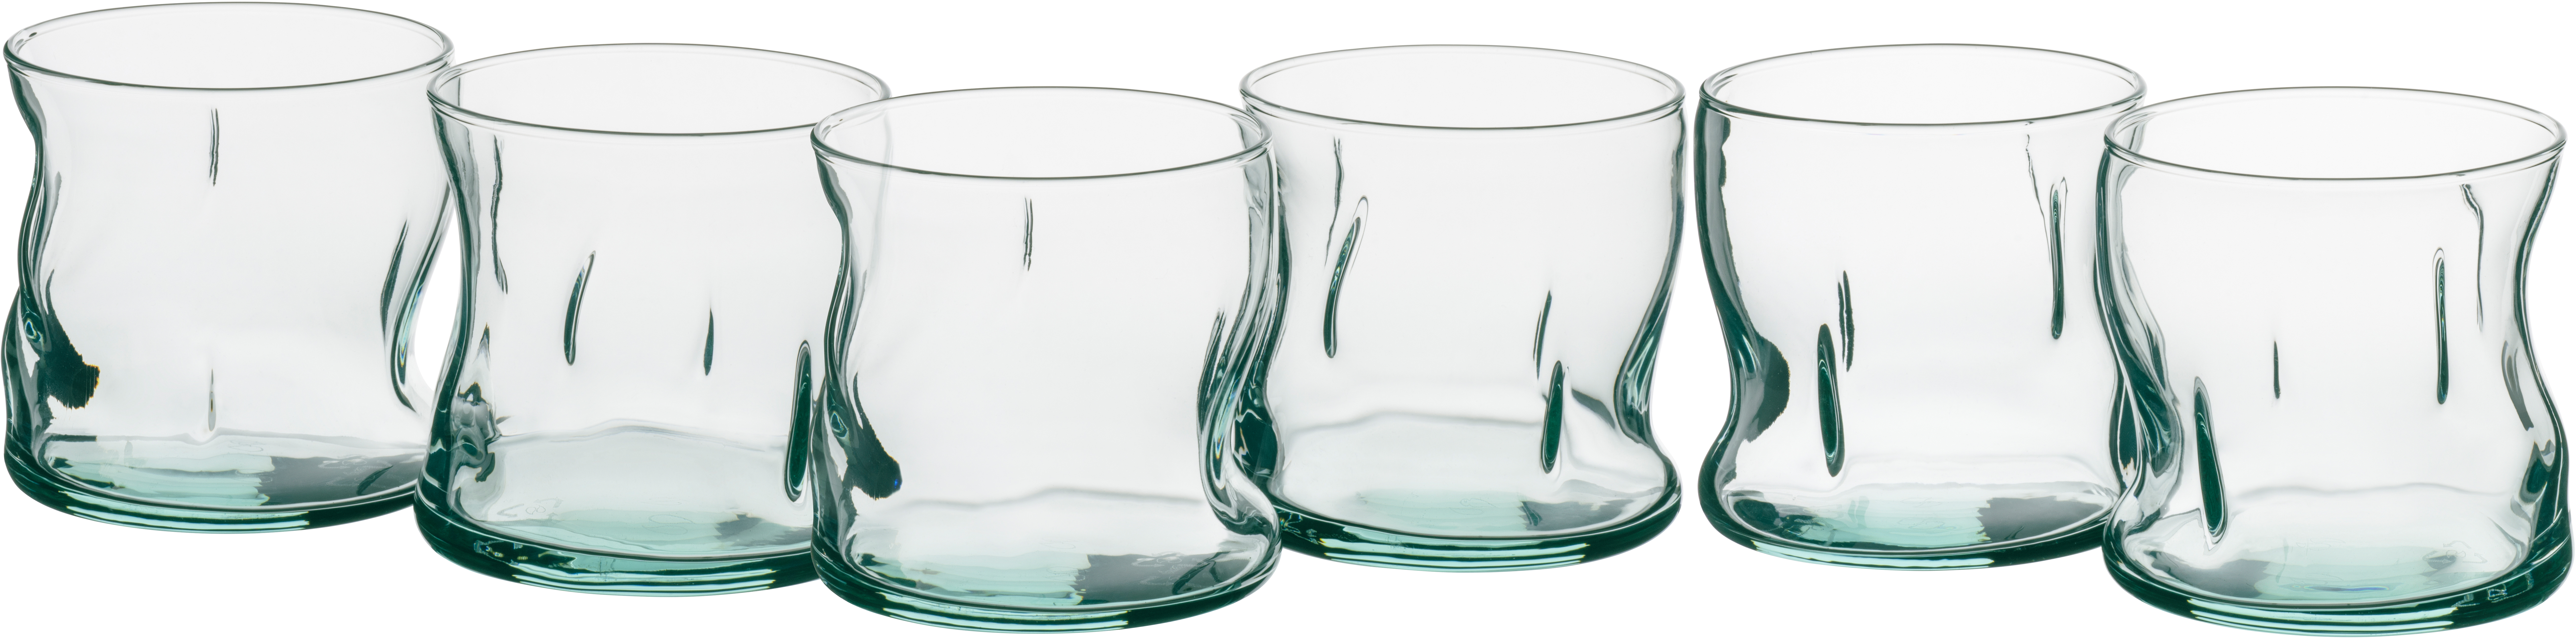 OTTO products Longdrinkglas »Ezzo«, (Set, 6 tlg.), 6-teilig kaufen